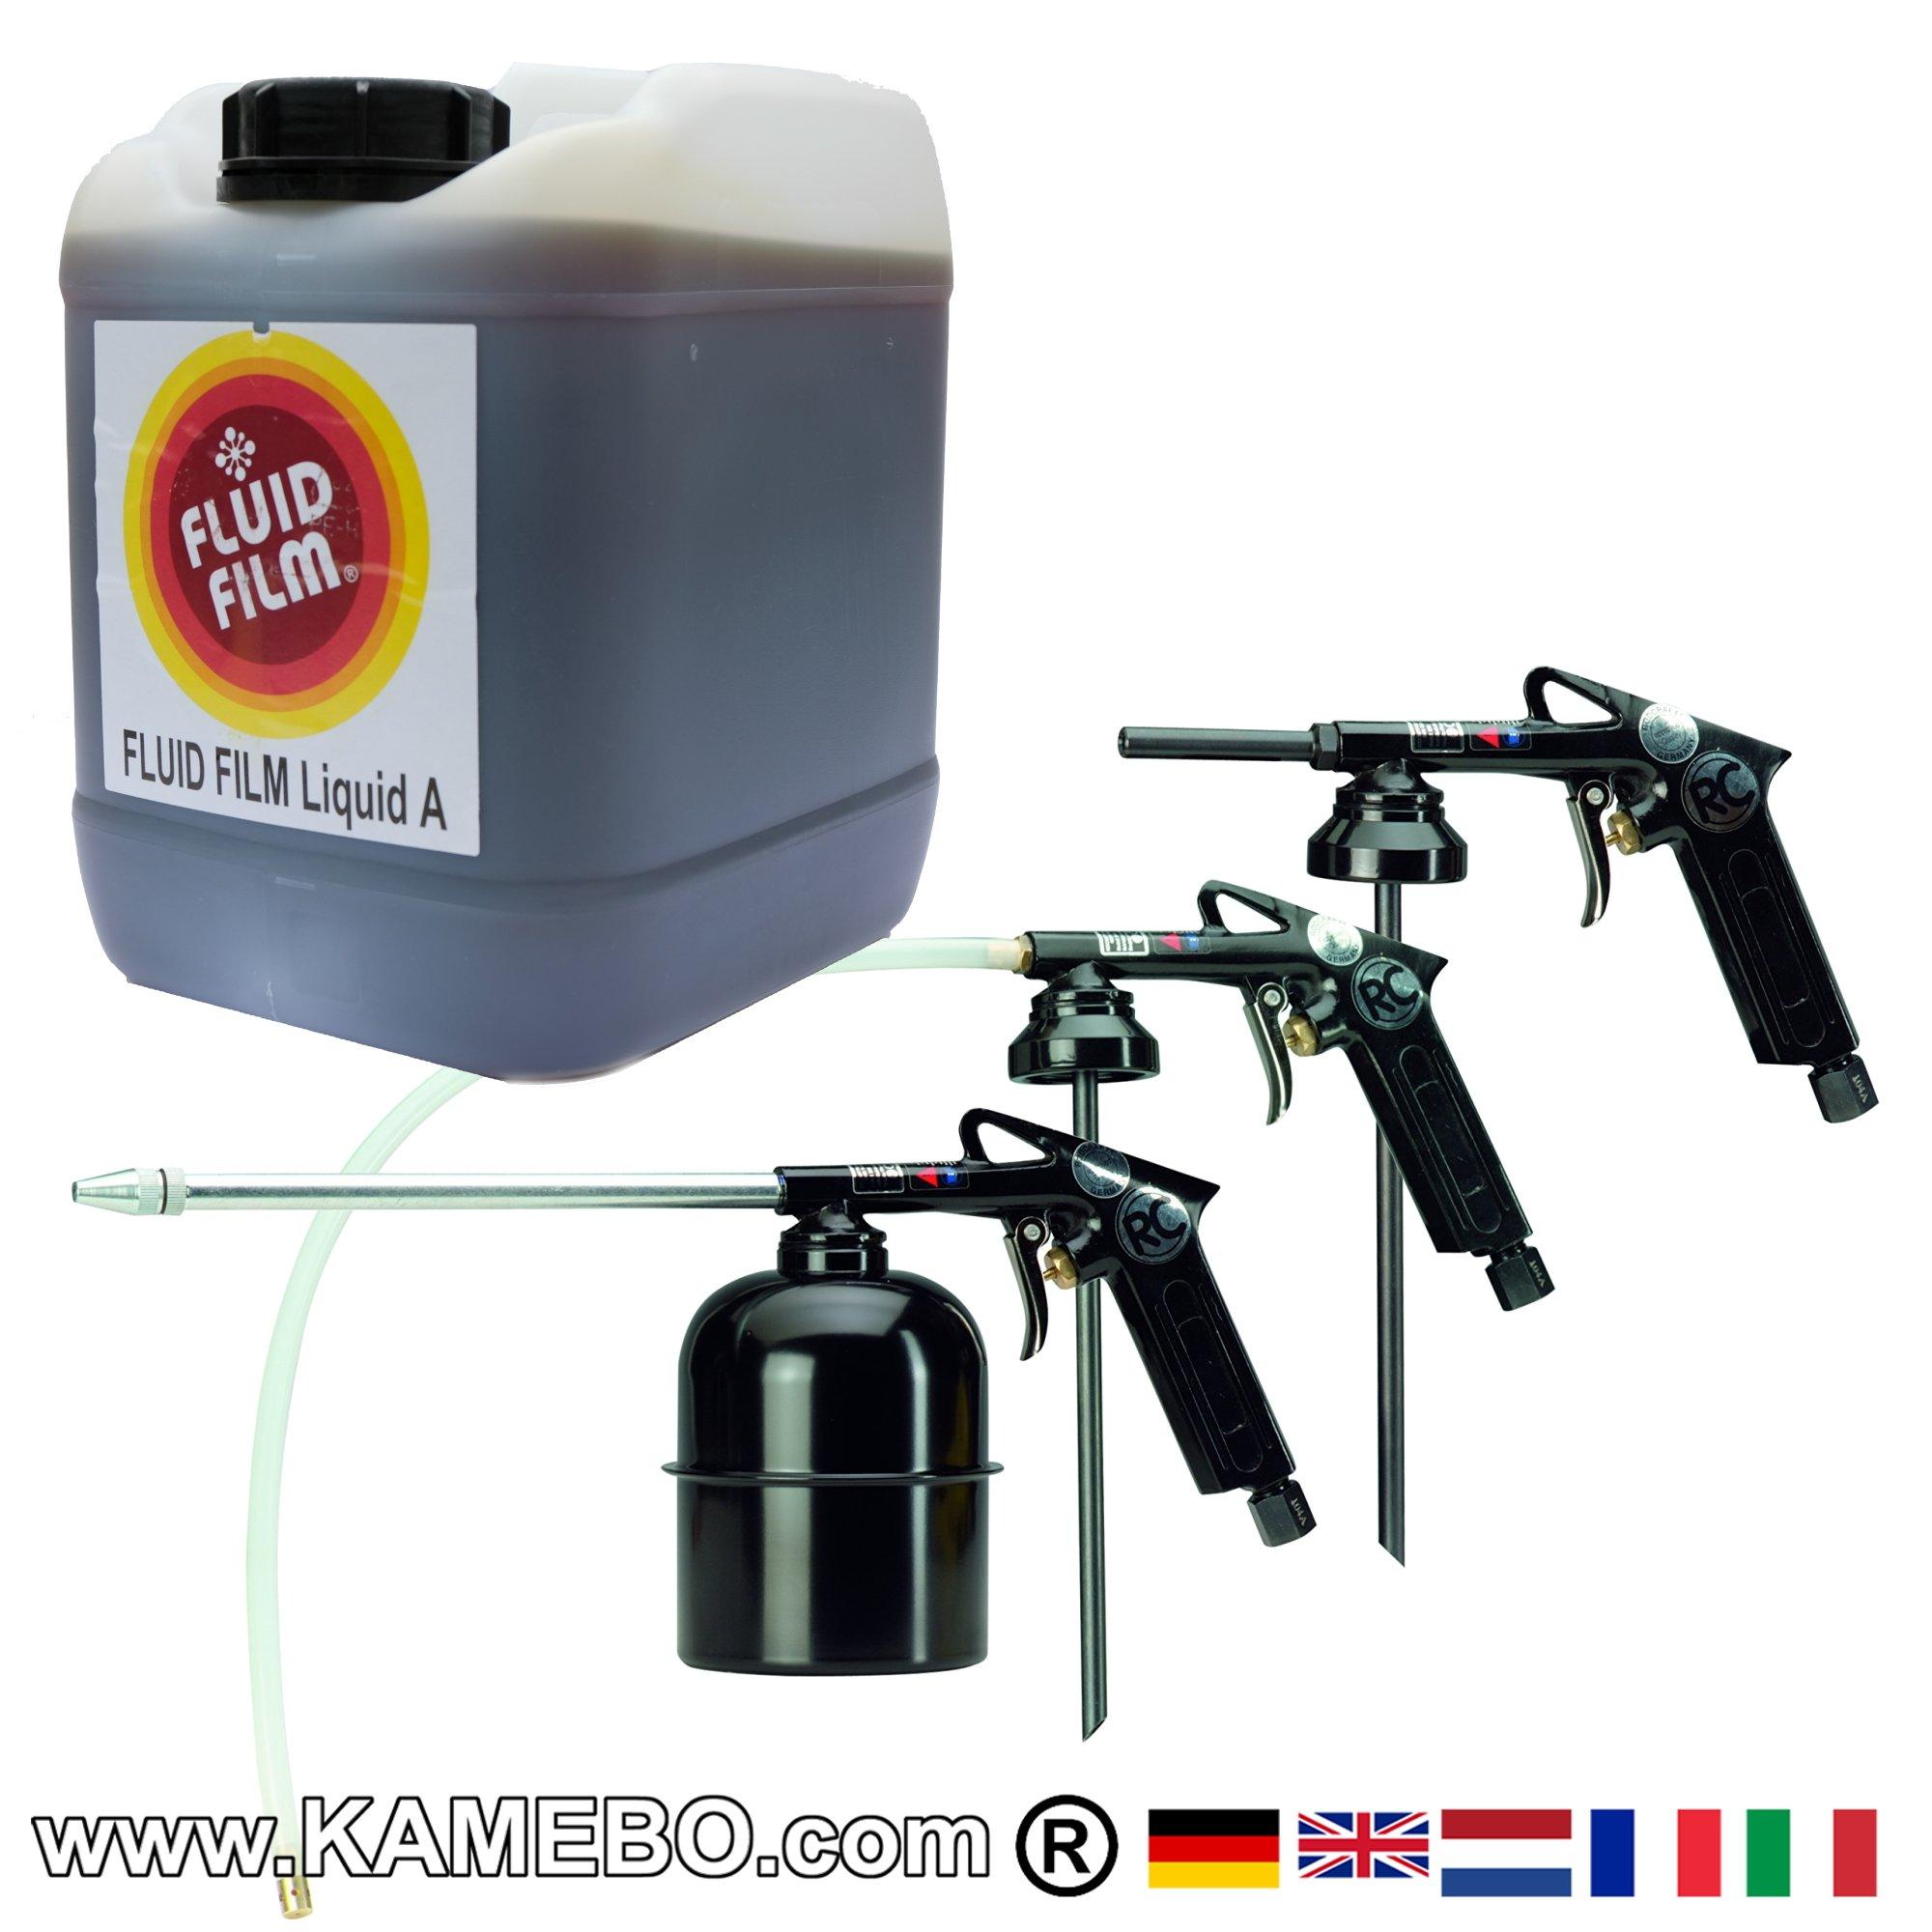 fluid film liquid a rodcraft rc8035 kit kamebo. Black Bedroom Furniture Sets. Home Design Ideas